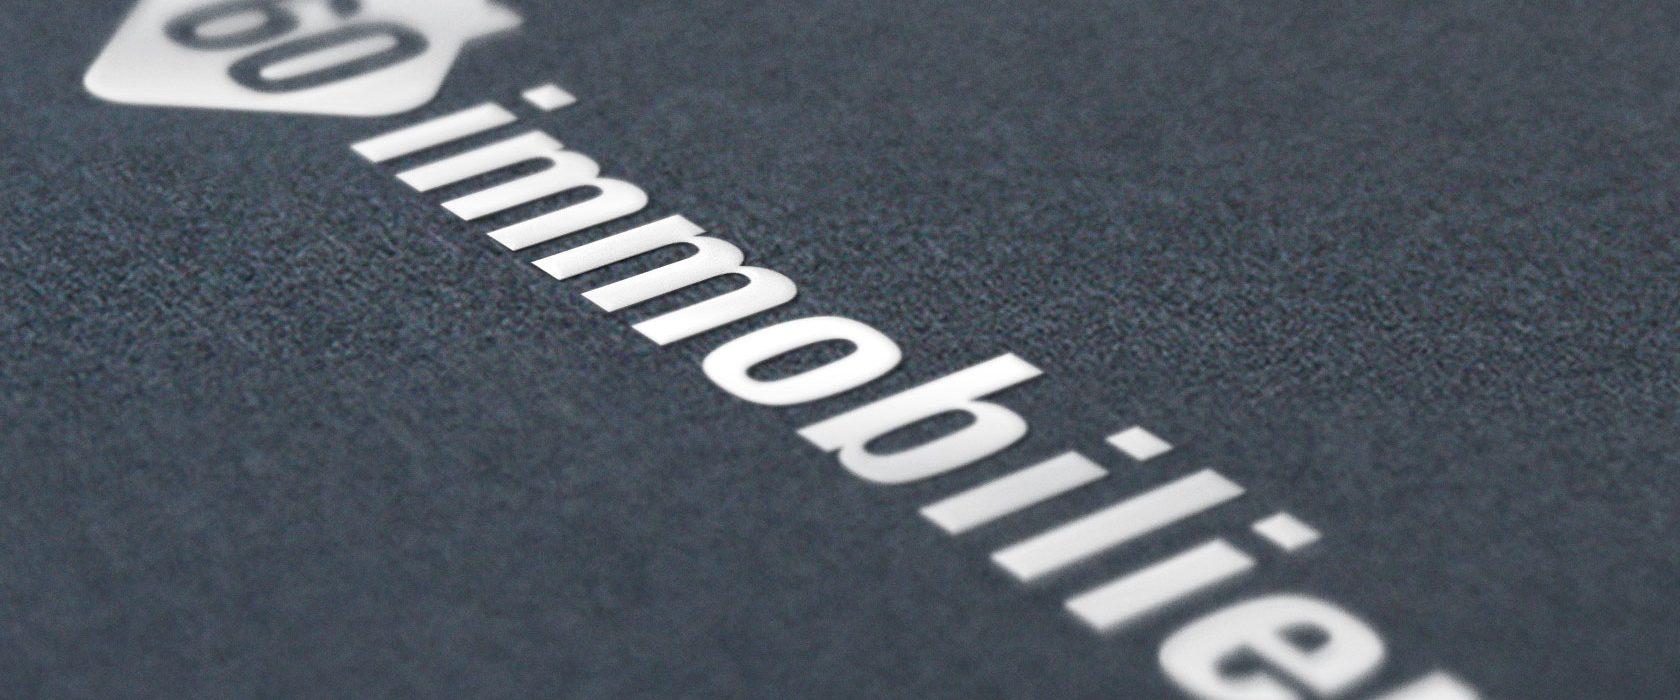 création logo 60immobilier